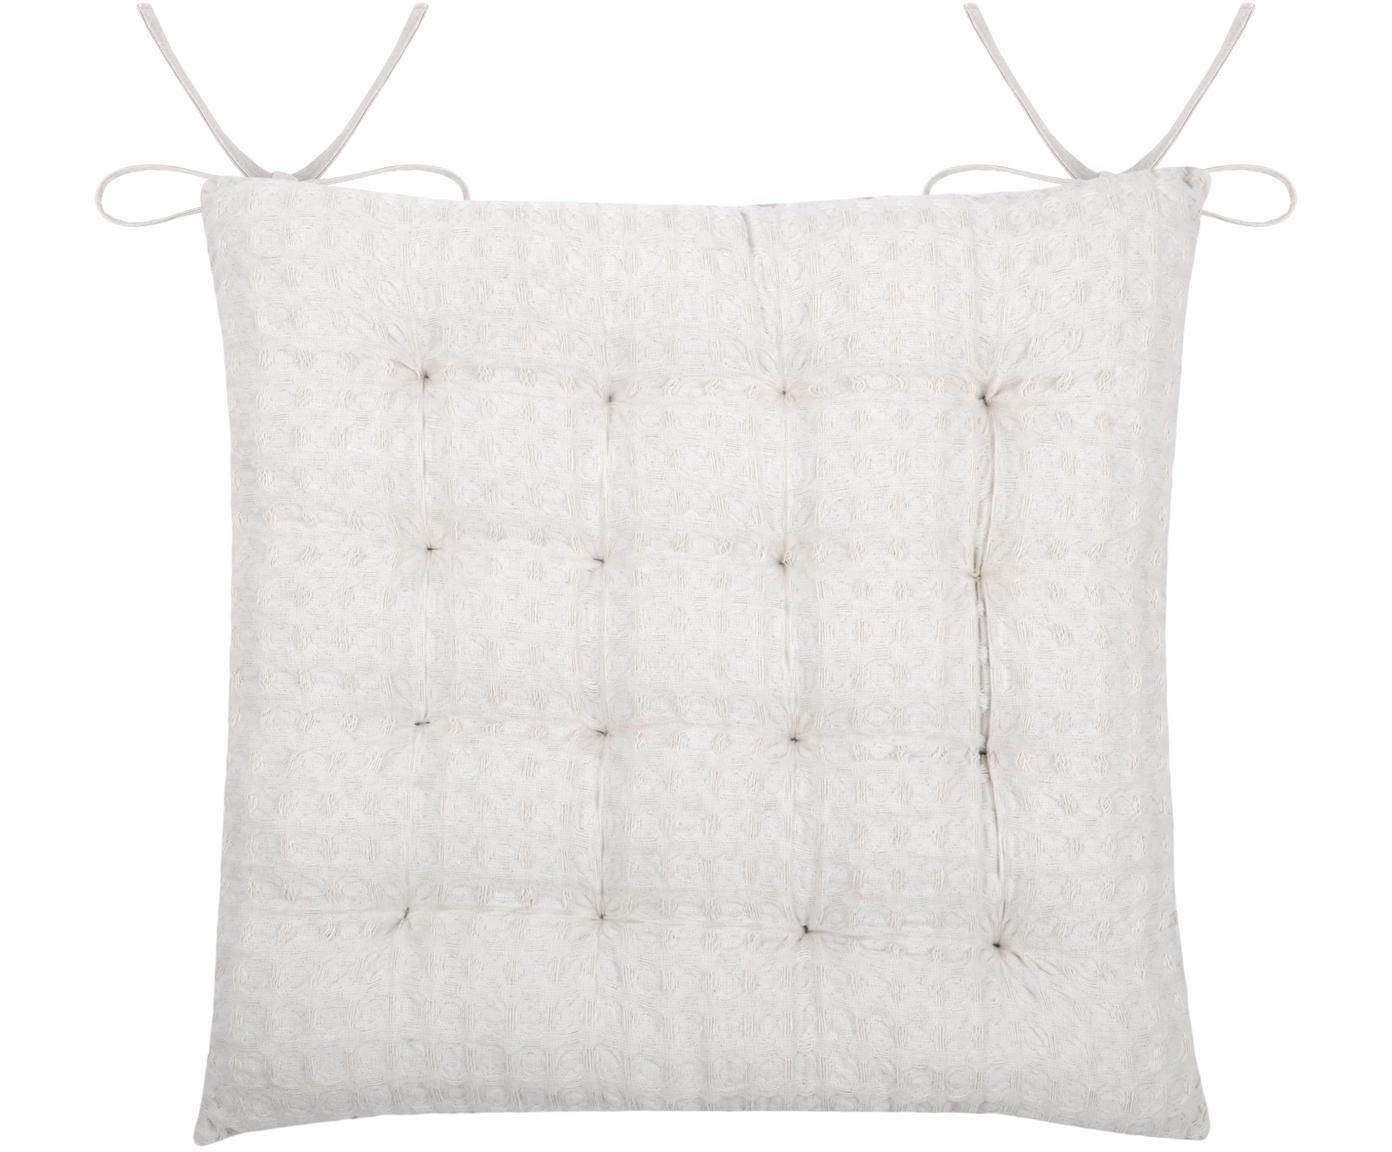 Cojín de asiento Gopher, Funda: 100%algodón, Blanco, An 40 x L 40 cm